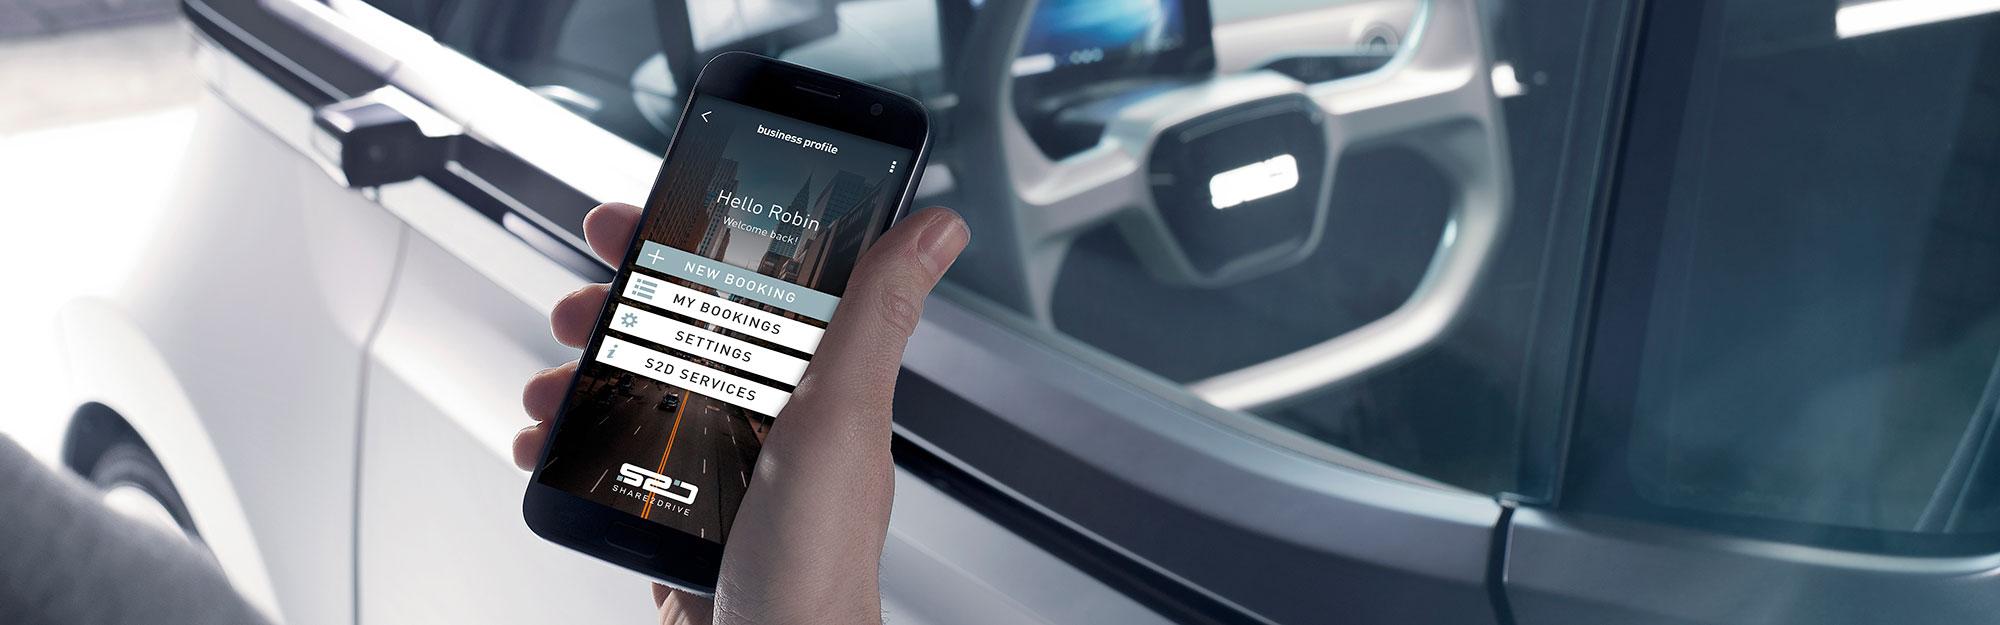 Braunwagner Digital und Media Design SVEN Booking App Screen Design